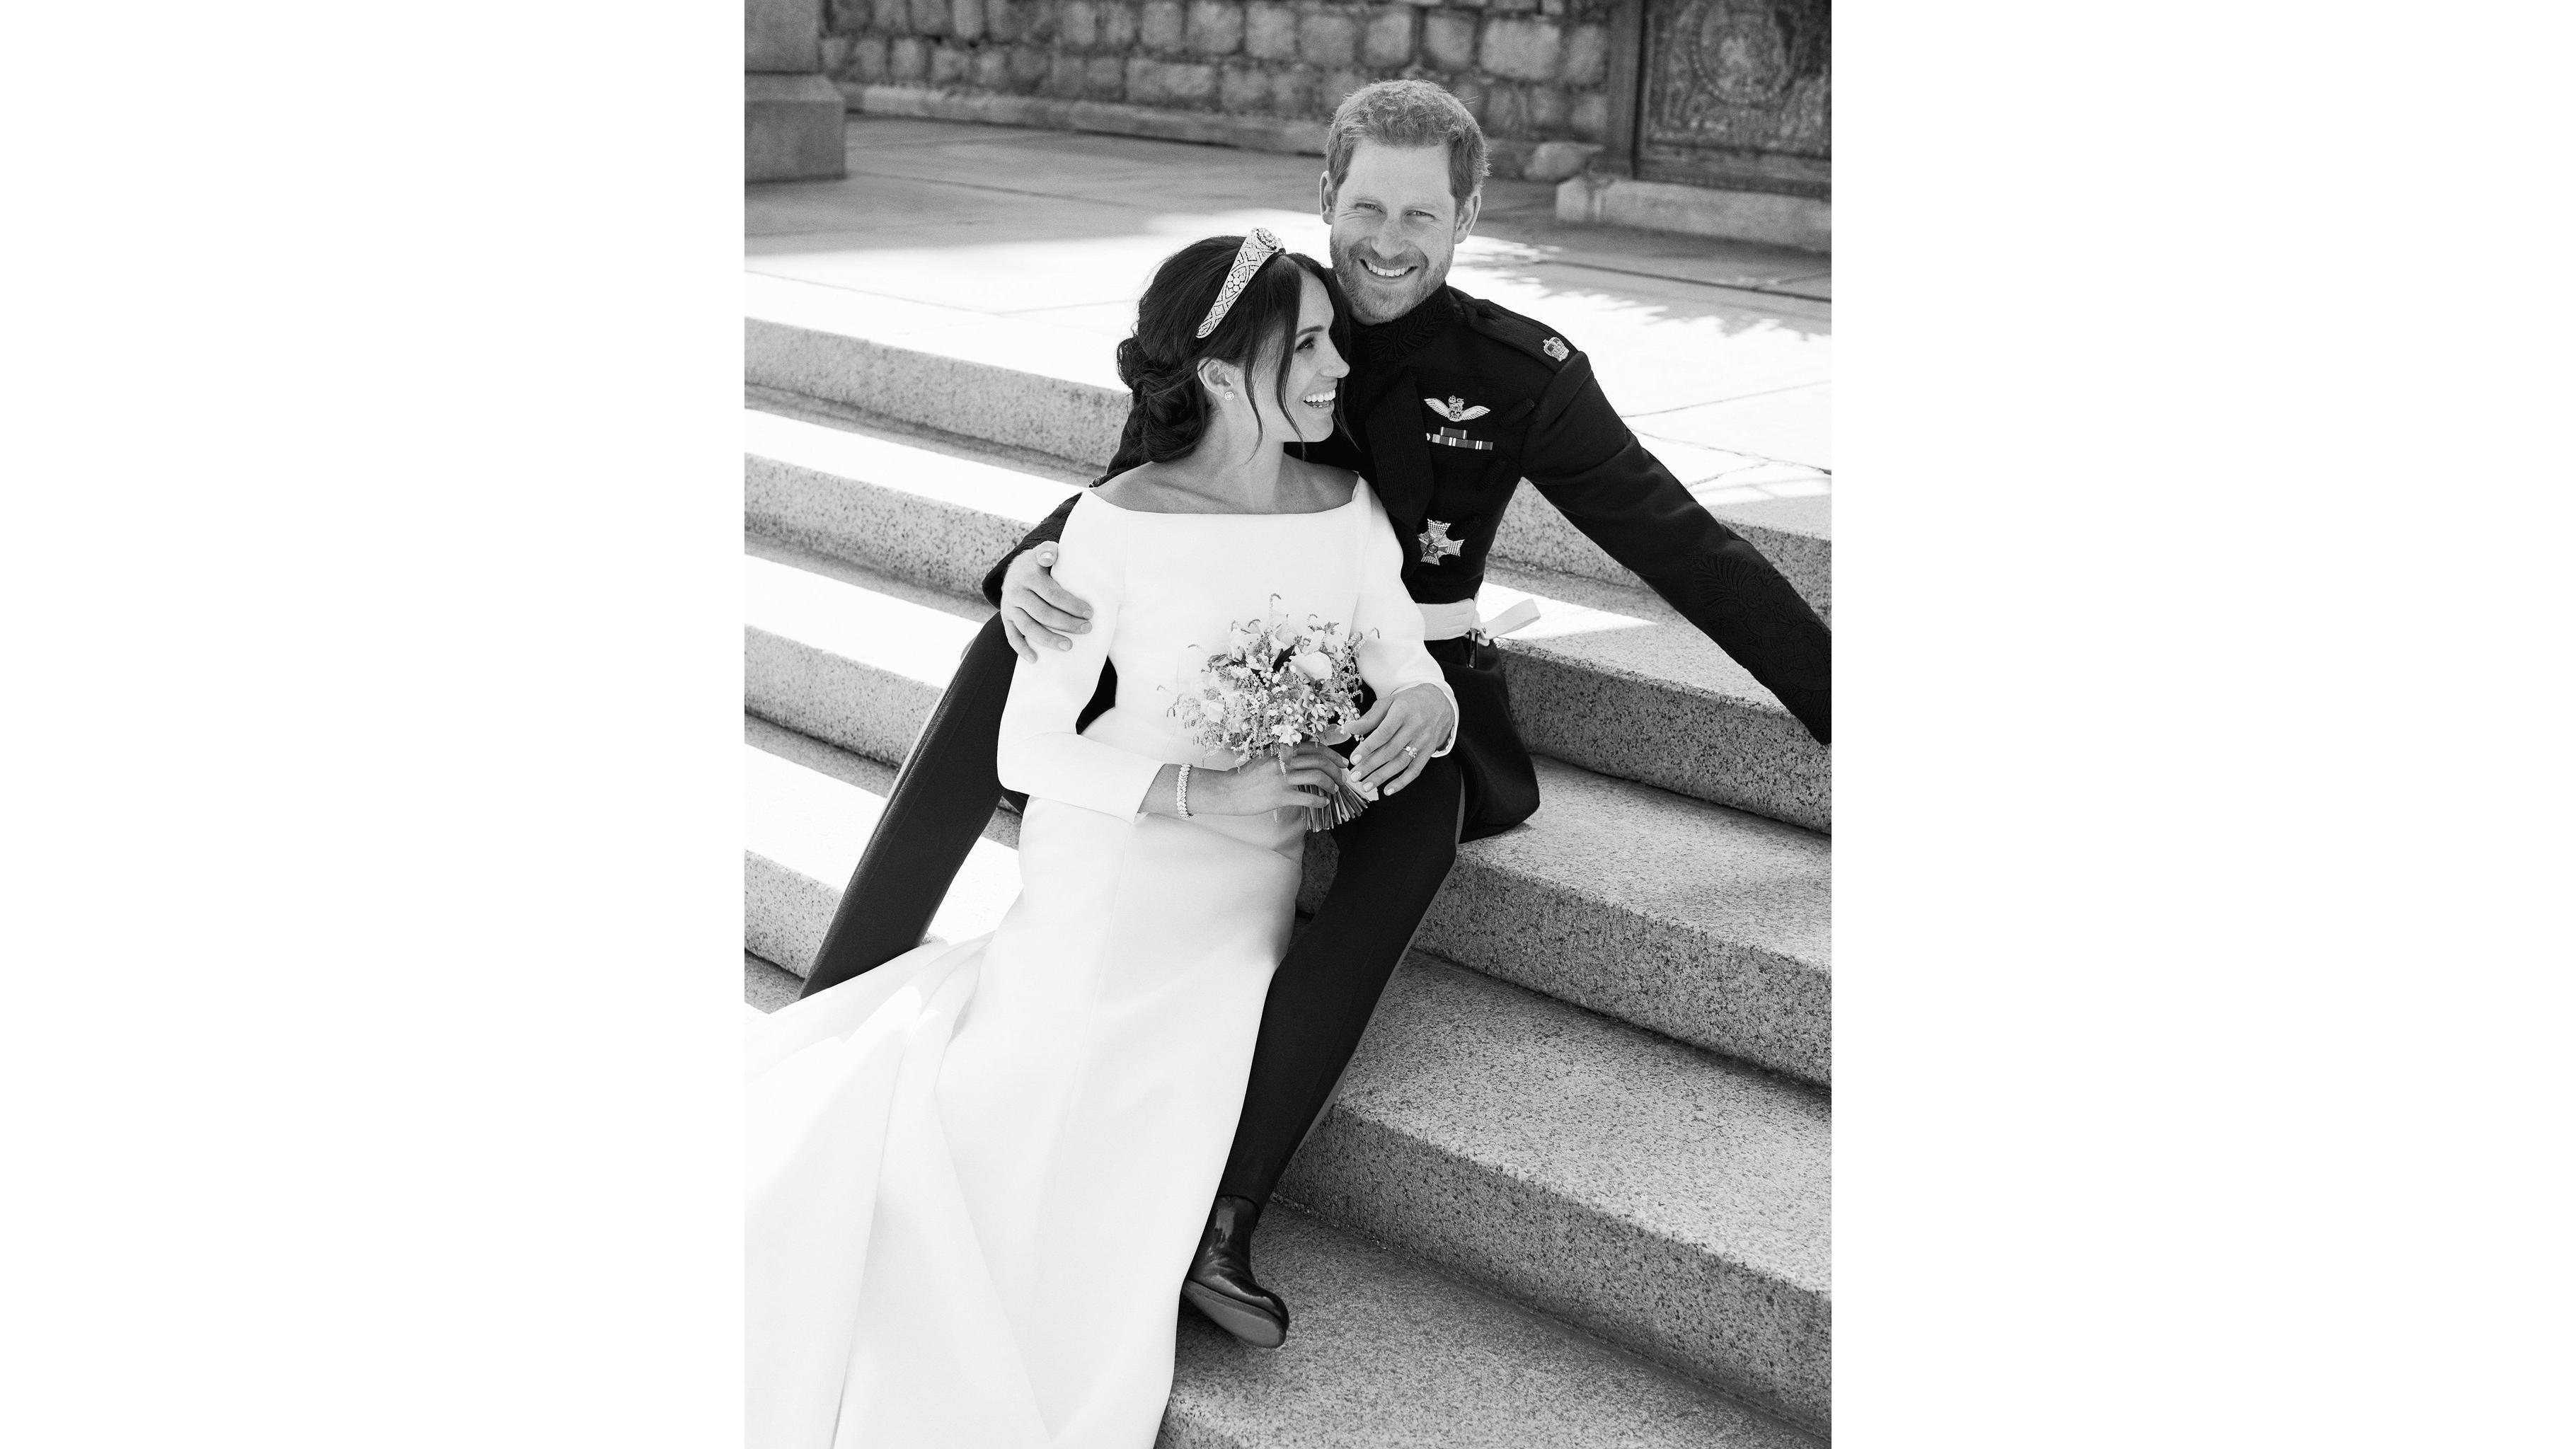 royal wedding harry and meghan release official photos cnn style